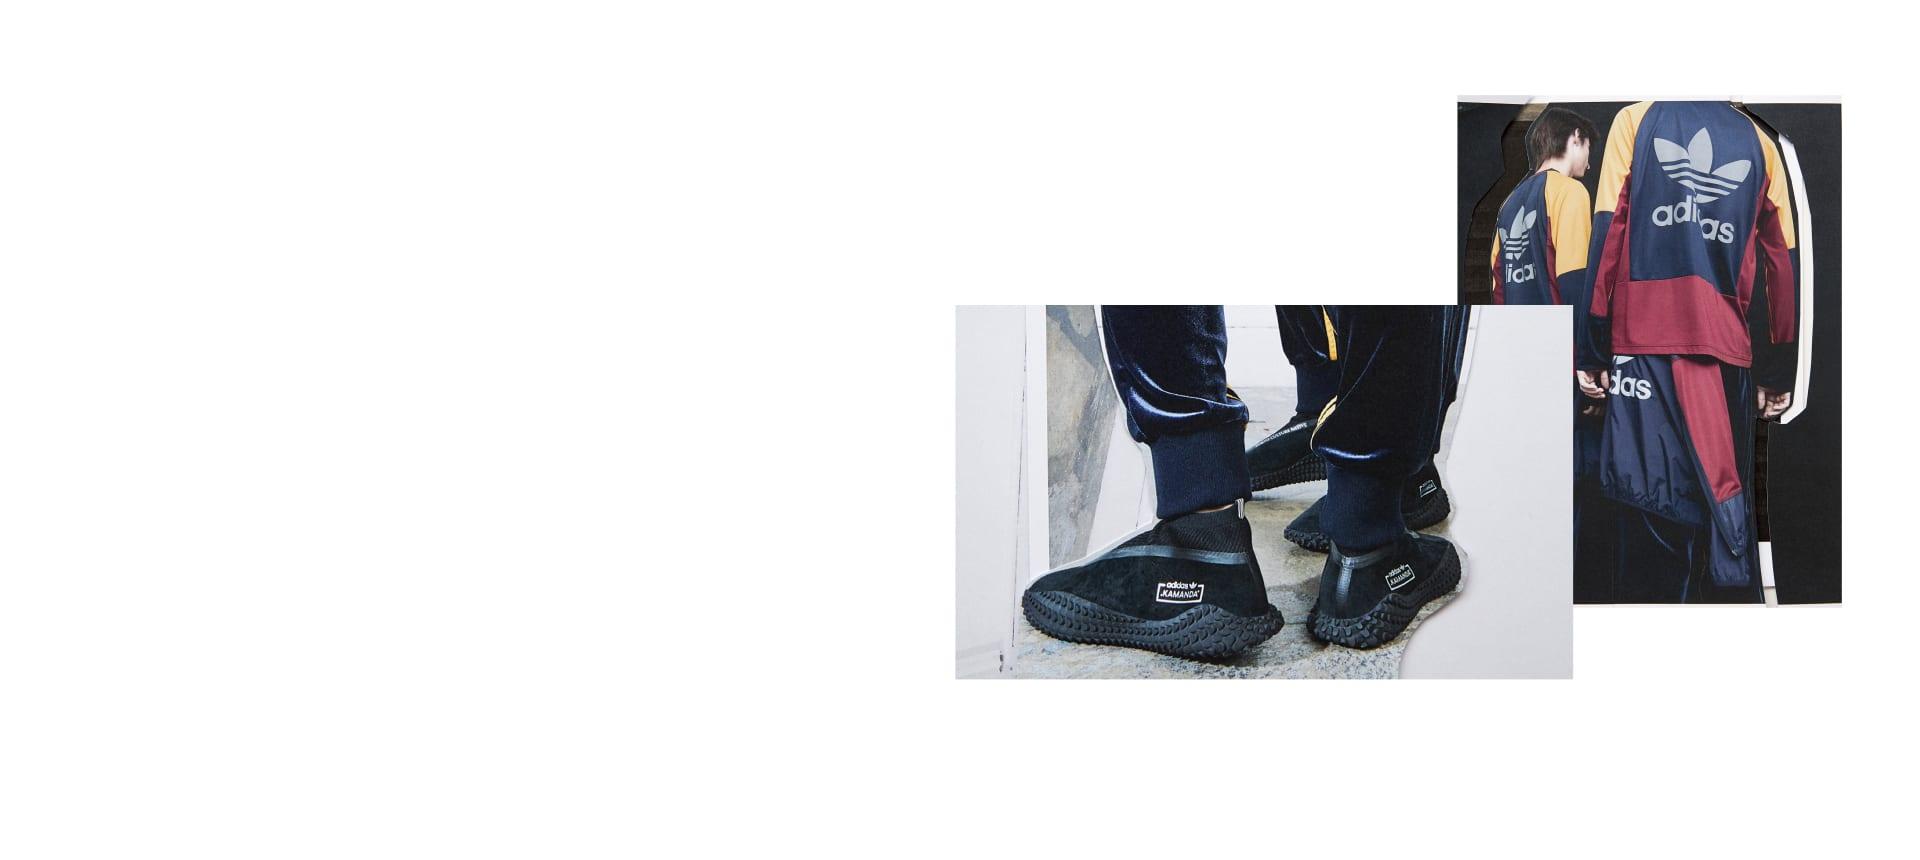 OriginalsBoutique Officielle OriginalsBoutique Adidas Officielle Adidas OriginalsBoutique Adidas Officielle Adidas T3lc1Ju5FK